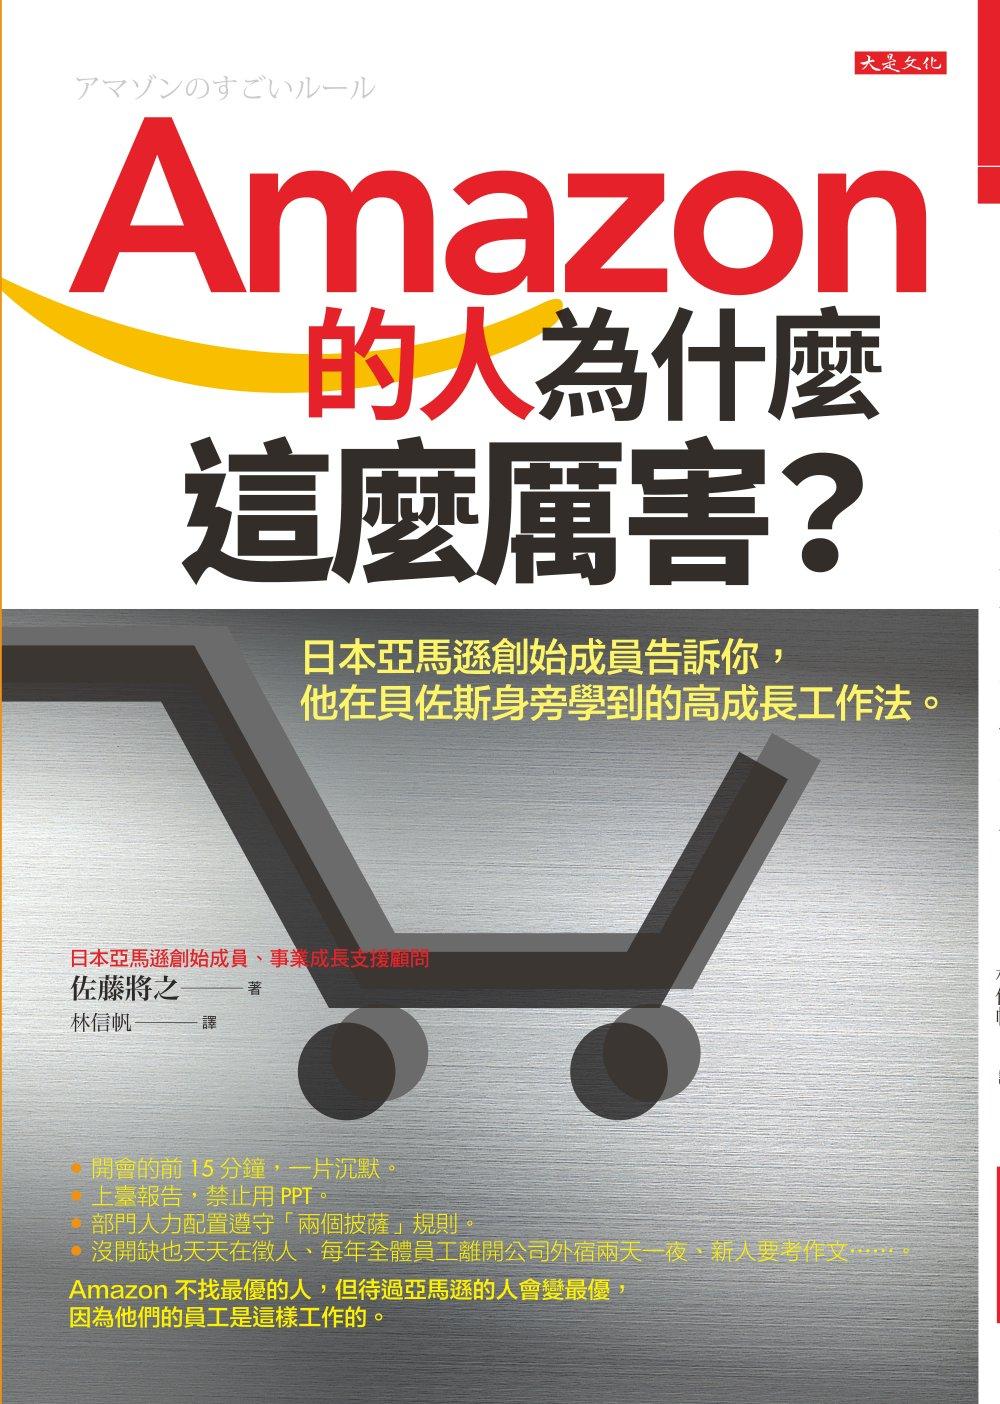 Amazon的人為什麼這麼厲害?:日本亞馬遜創始成員告訴你,他在貝佐斯身旁學到的高成長工作法。 (電子書)